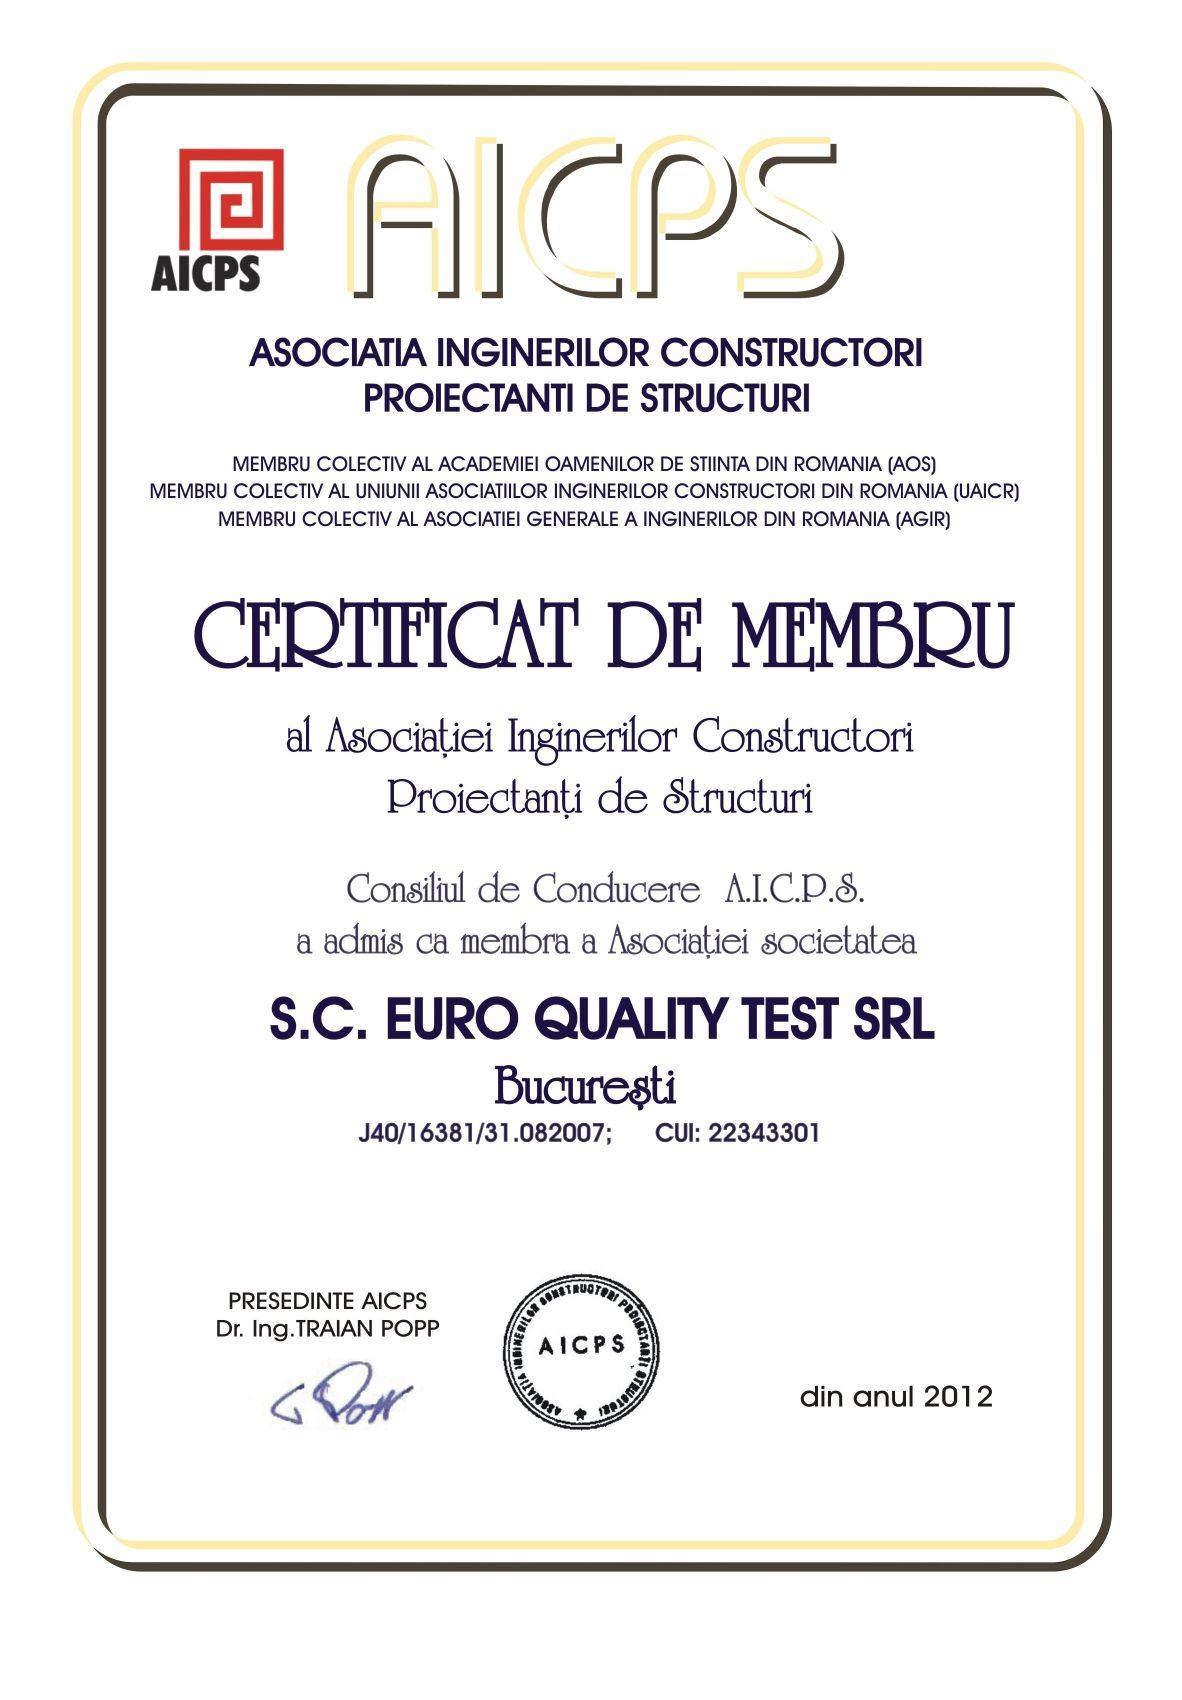 9f8hm_Certificat_AICPS_EQT_1182x1700.jpg